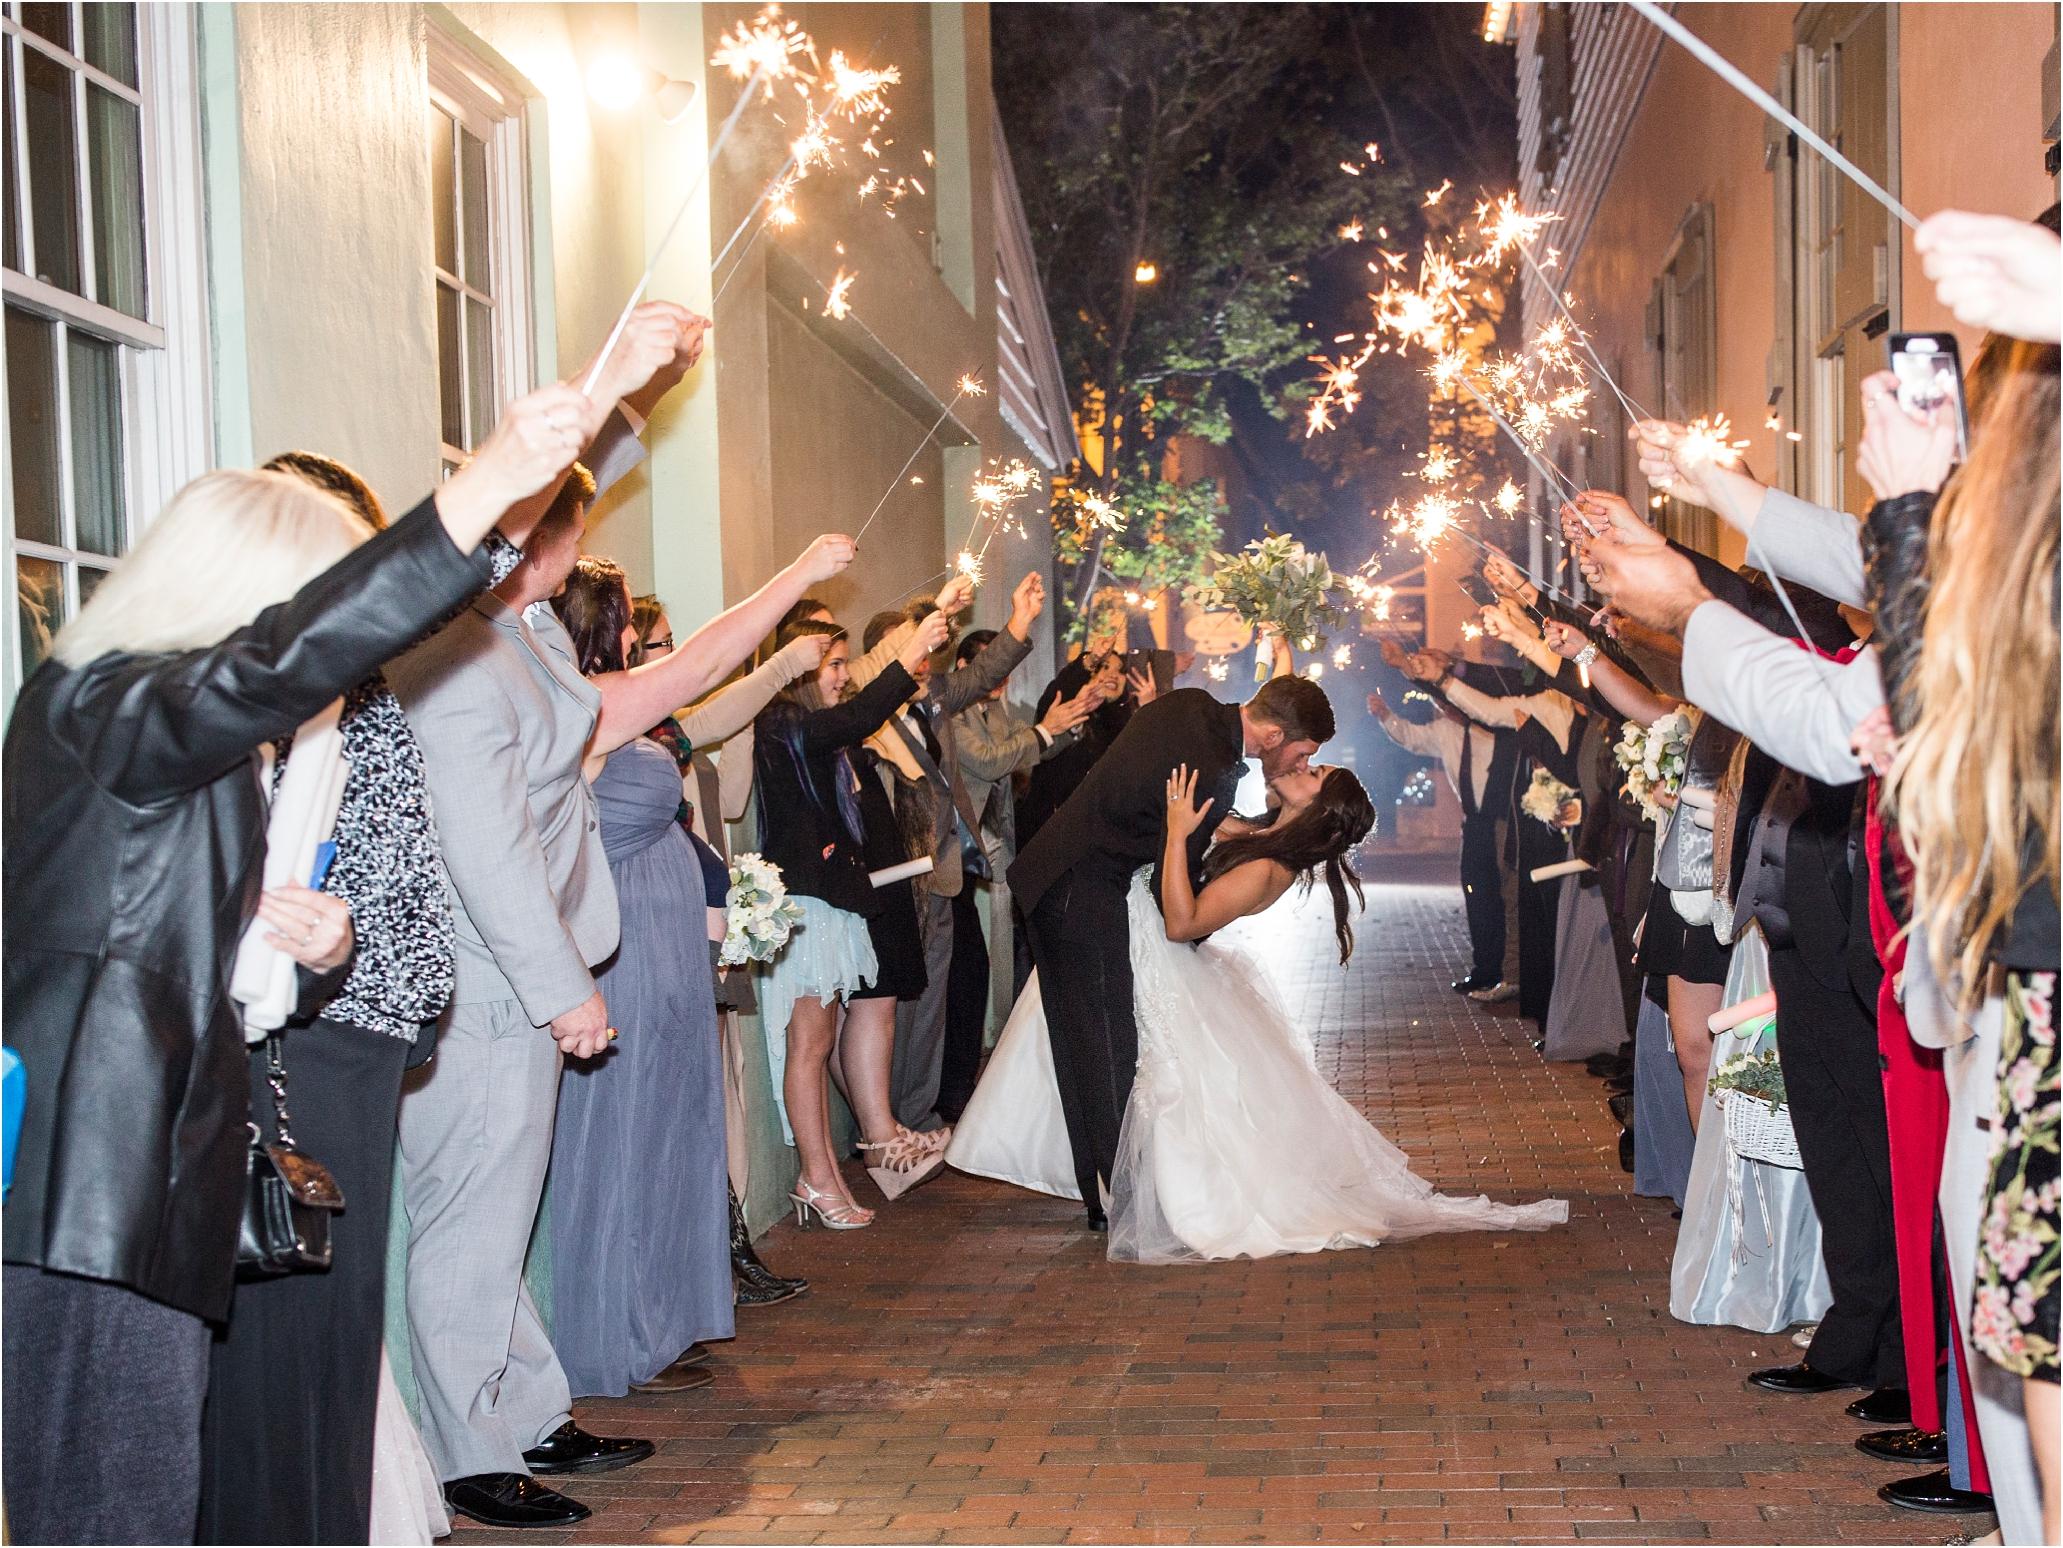 Lisa Silva Photography- Ponte Vedra Beach and Jacksonville, Florida Fine Art Film Wedding Photography- Wedding at The White Room Villa Blanca in St. Augustine, Florida_0072.jpg